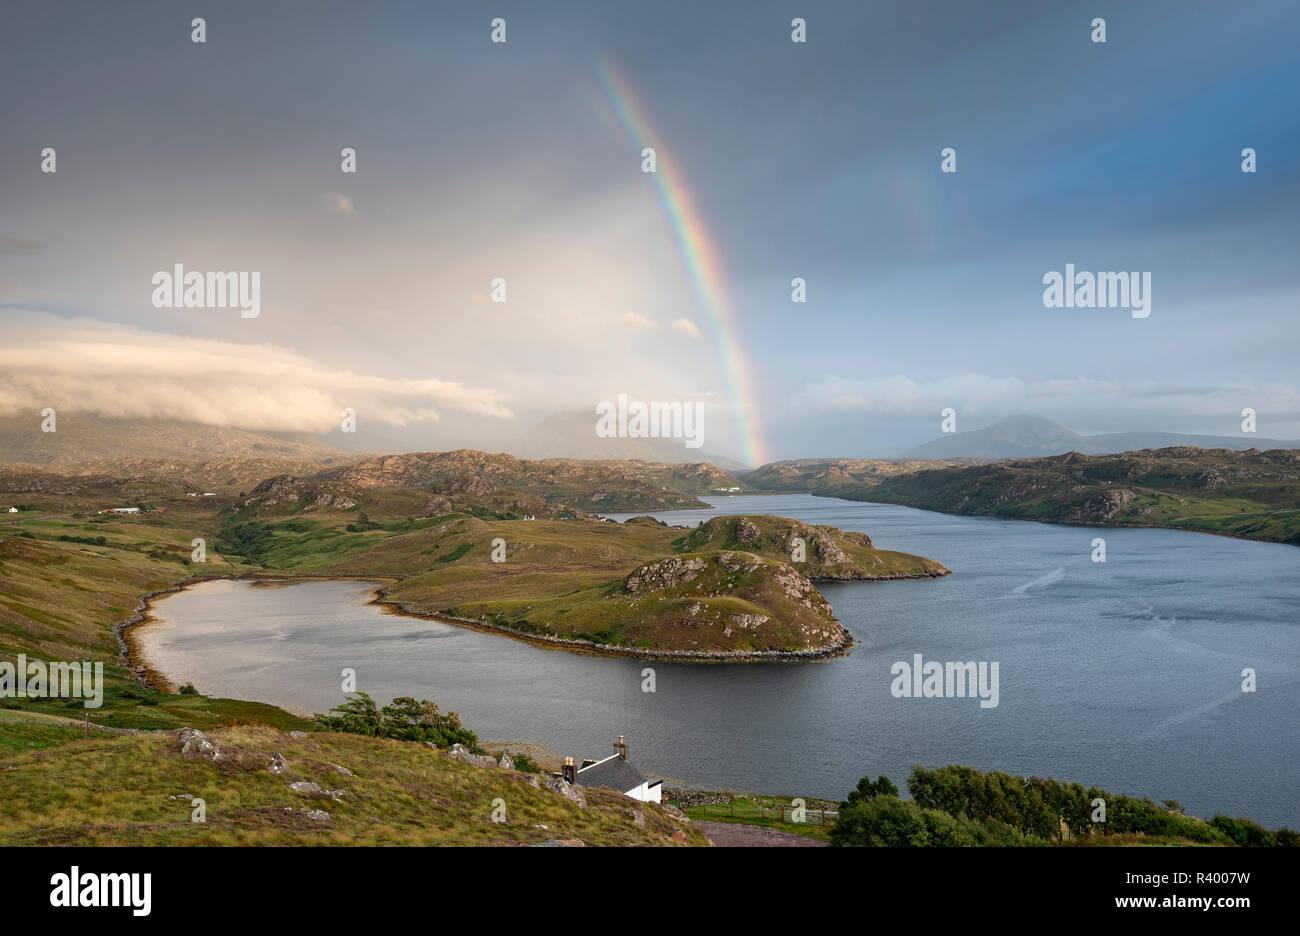 Light di arcobaleno sul mare ingresso Loch Inchard, Kinlochbervie, Sutherland, Nord-Ovest Highlands, Scozia Foto Stock